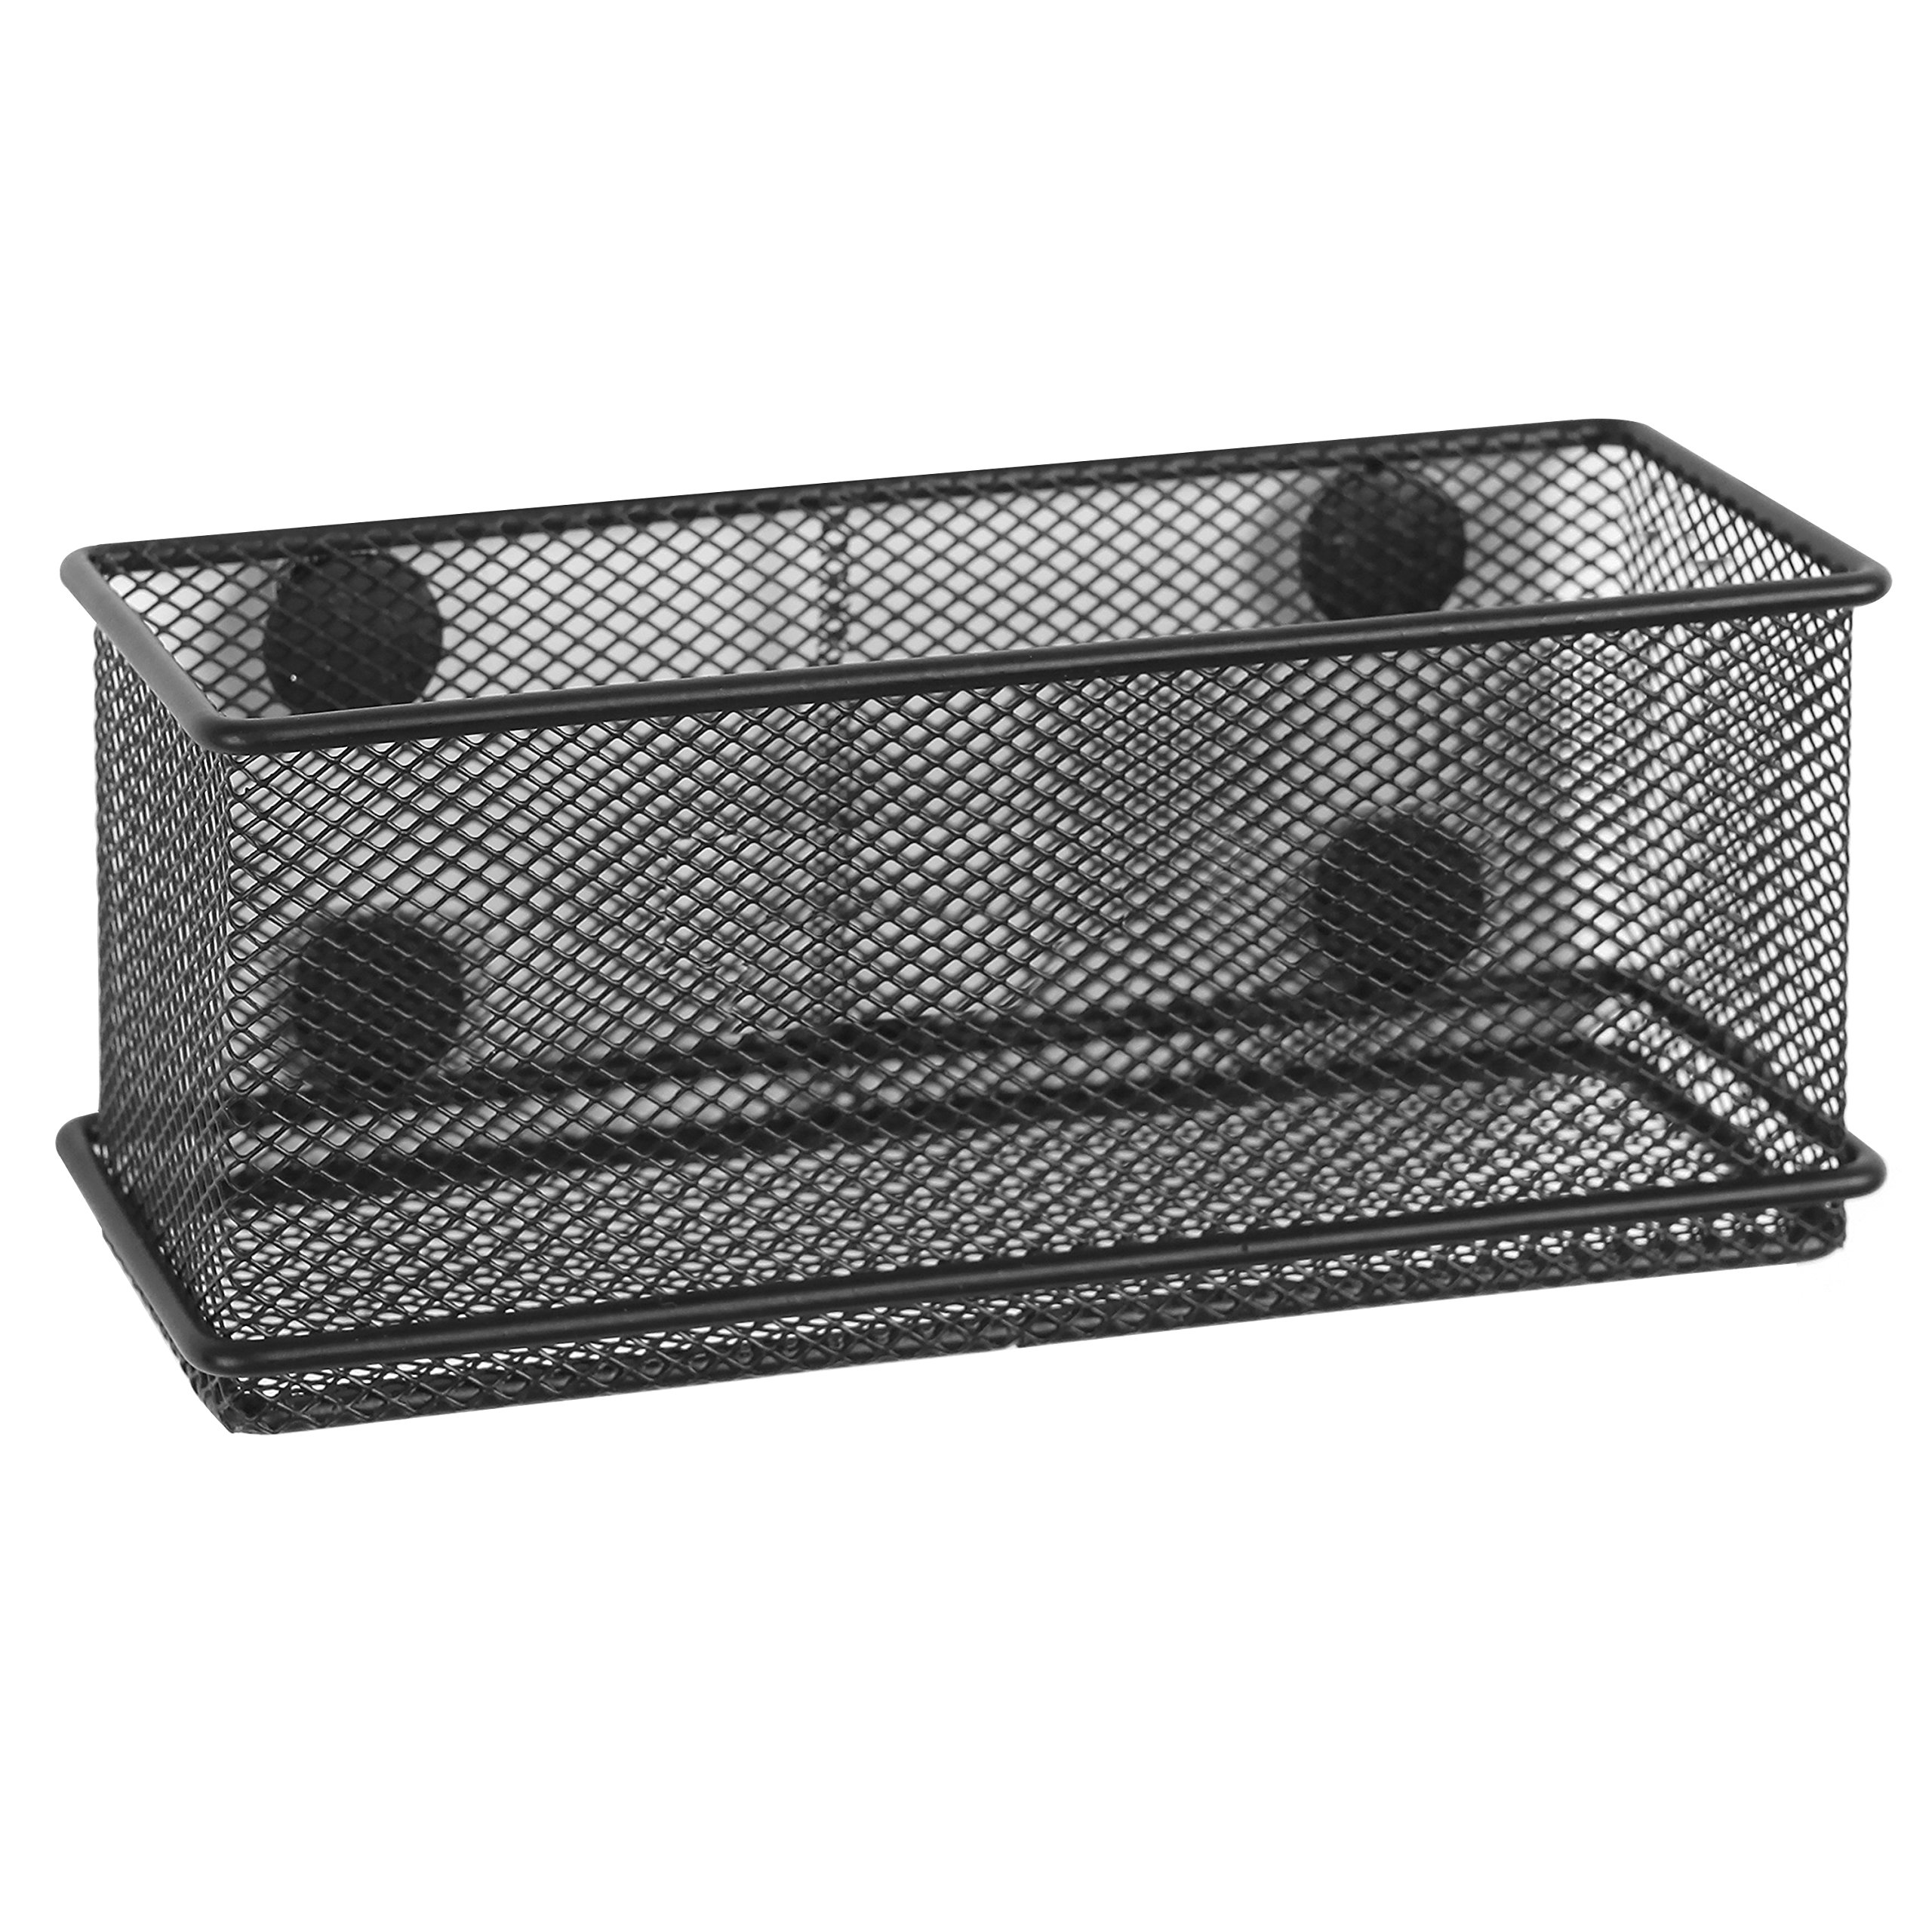 MyGift Modern Wire Mesh Magnetic Basket Storage Tray, Office Whiteboard Supply Organizer, Black